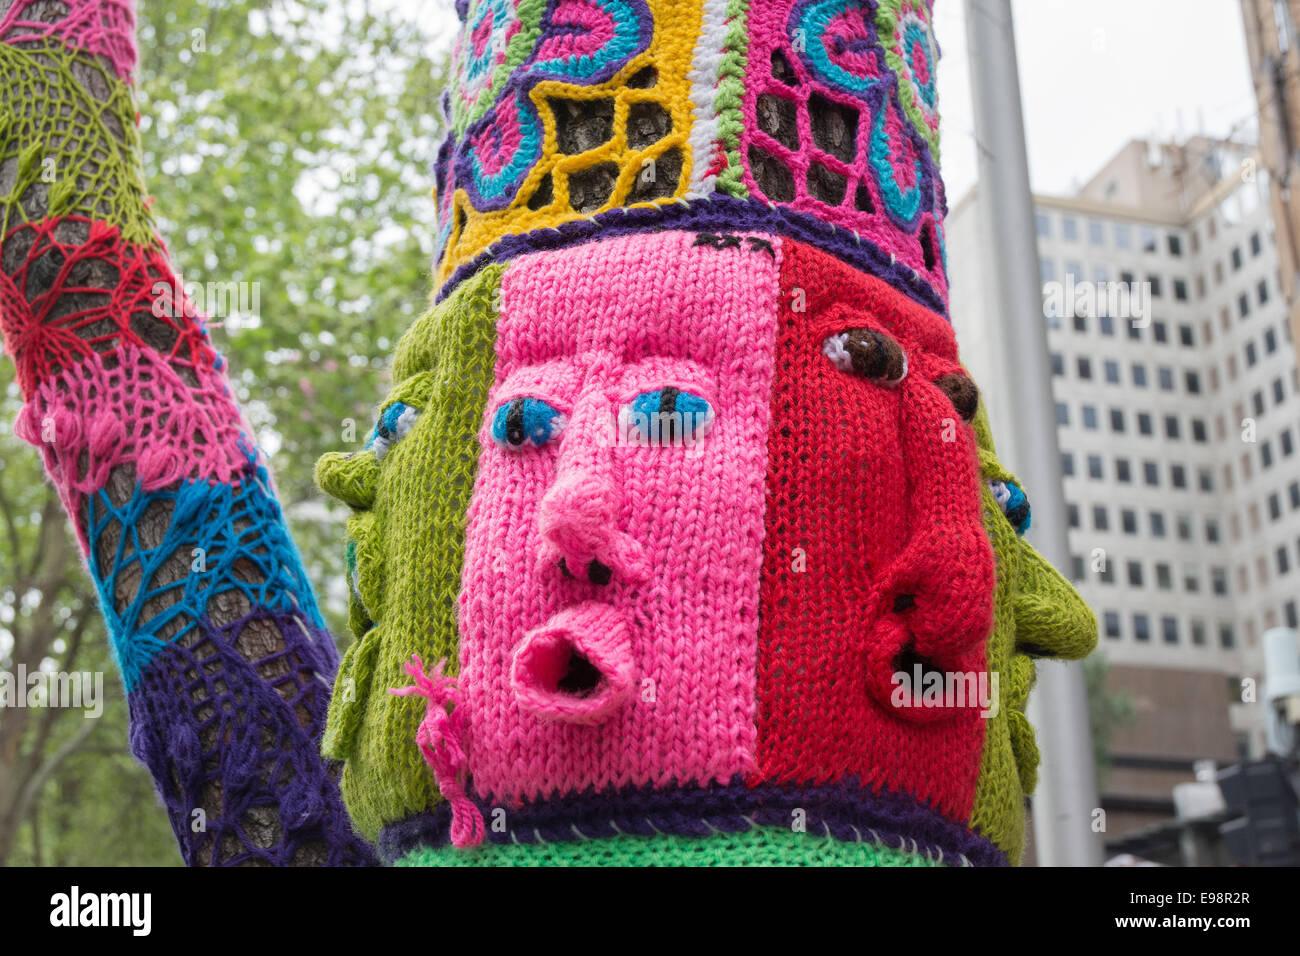 Knitted Street Art Yarn Bombing Tree Melbourne Australia ...